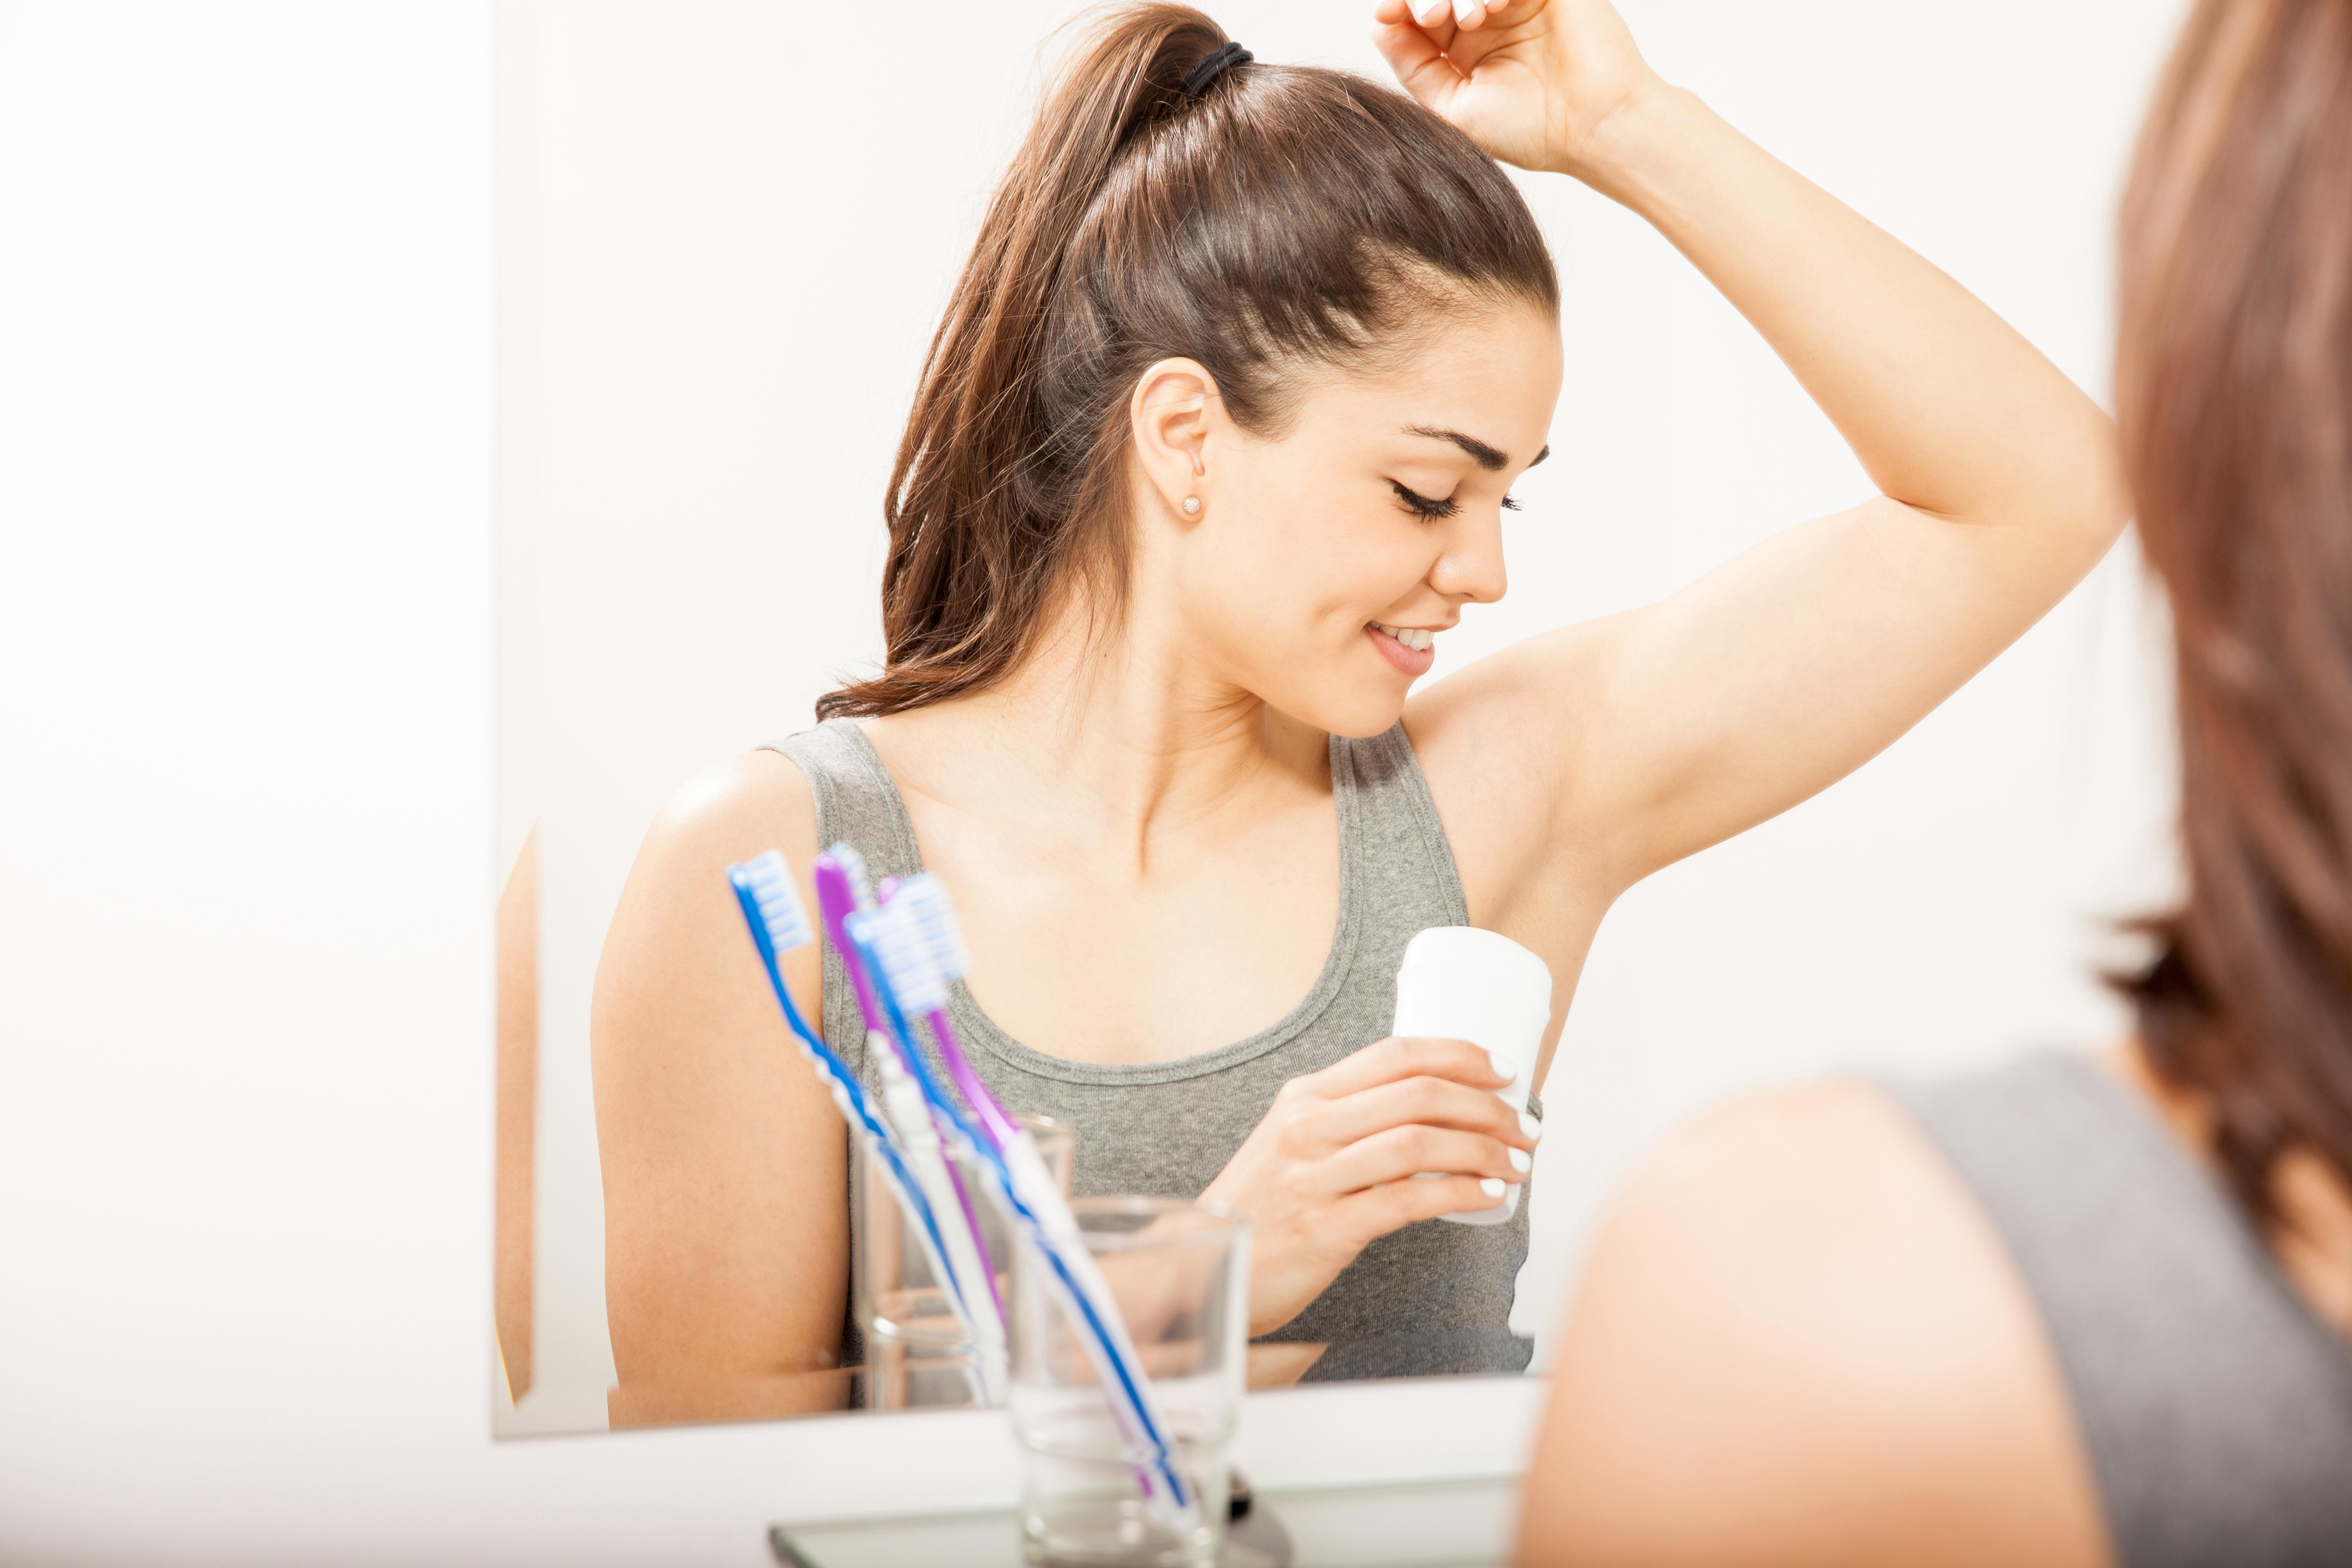 Do You Really Need to Buy Aluminum-Free Deodorant? | Live